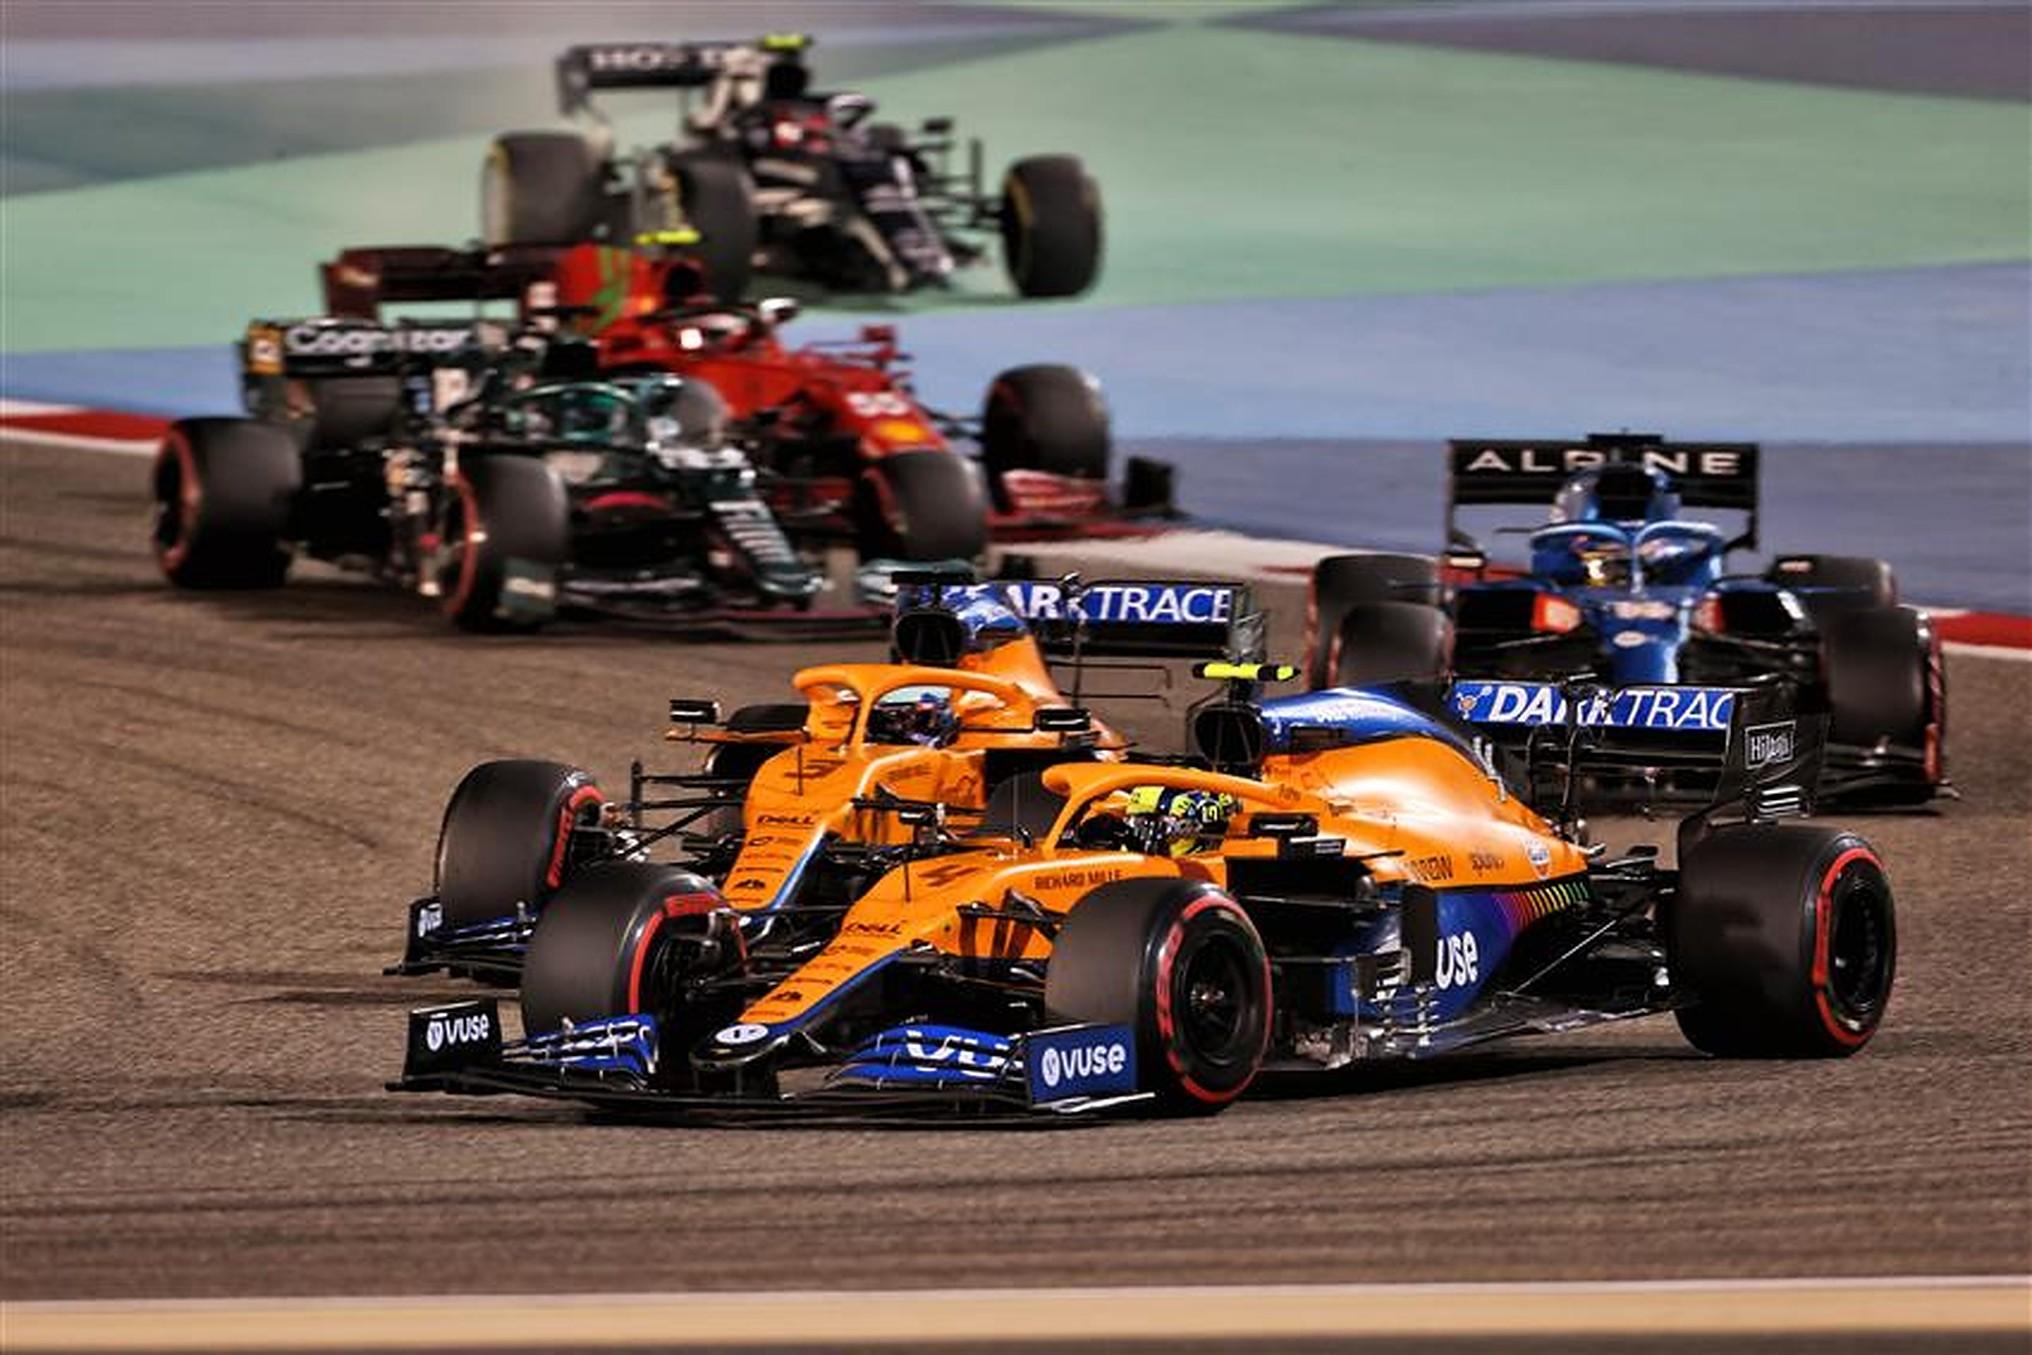 Daniel Ricciardo and Lando Norris at 2021 Bahrain GP with McLaren - Formula1news.co.uk